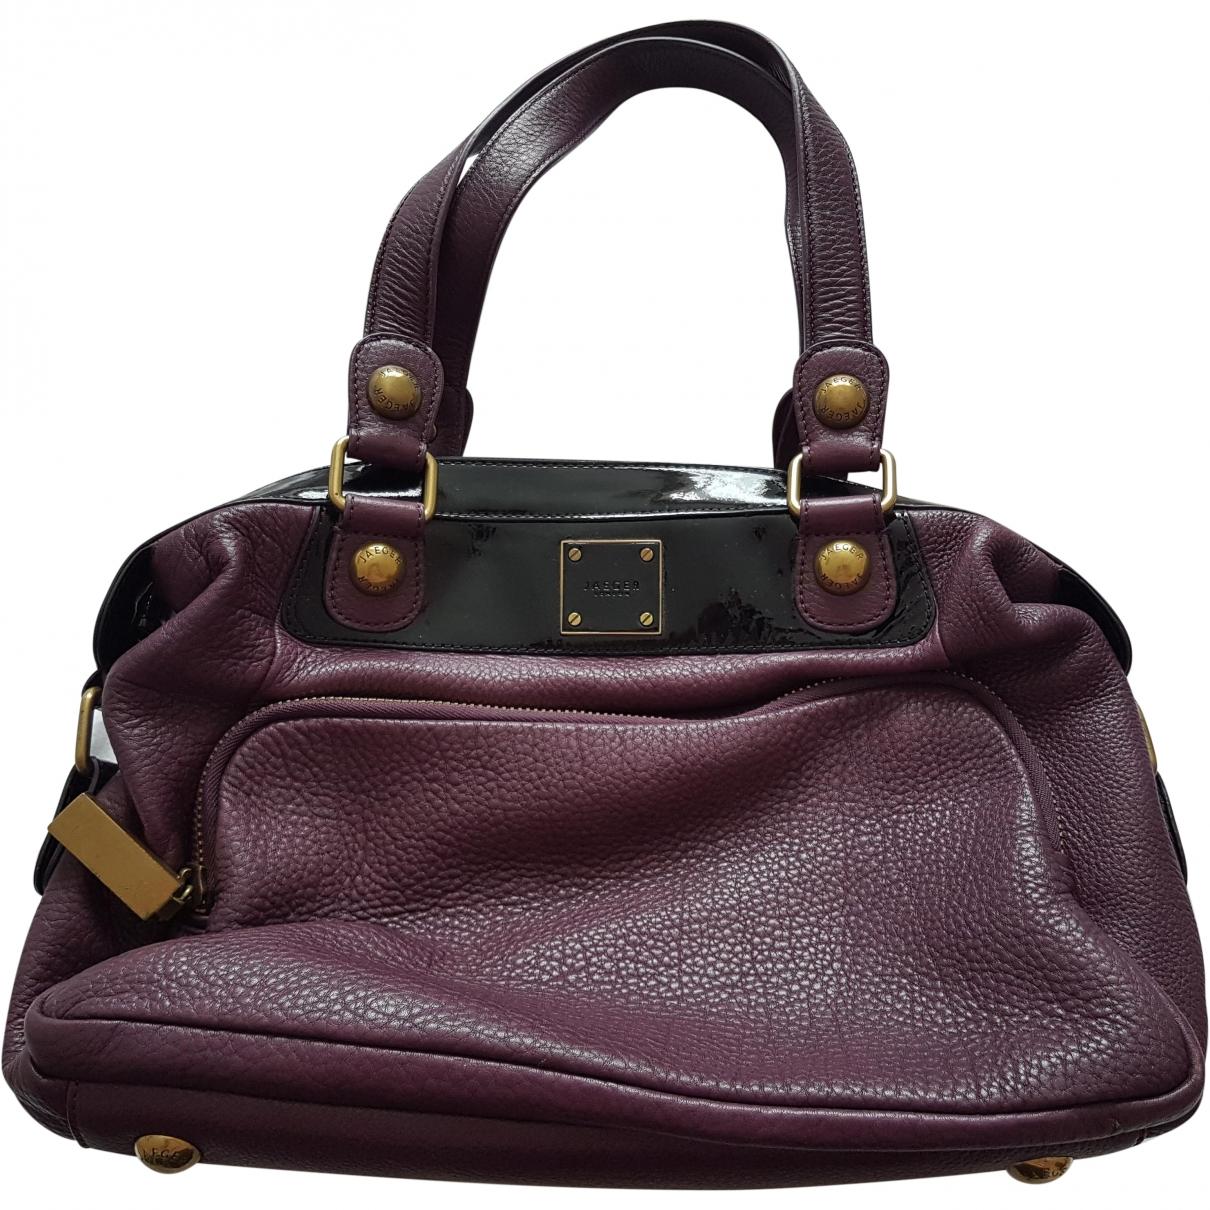 Jaeger London \N Purple Leather handbag for Women \N